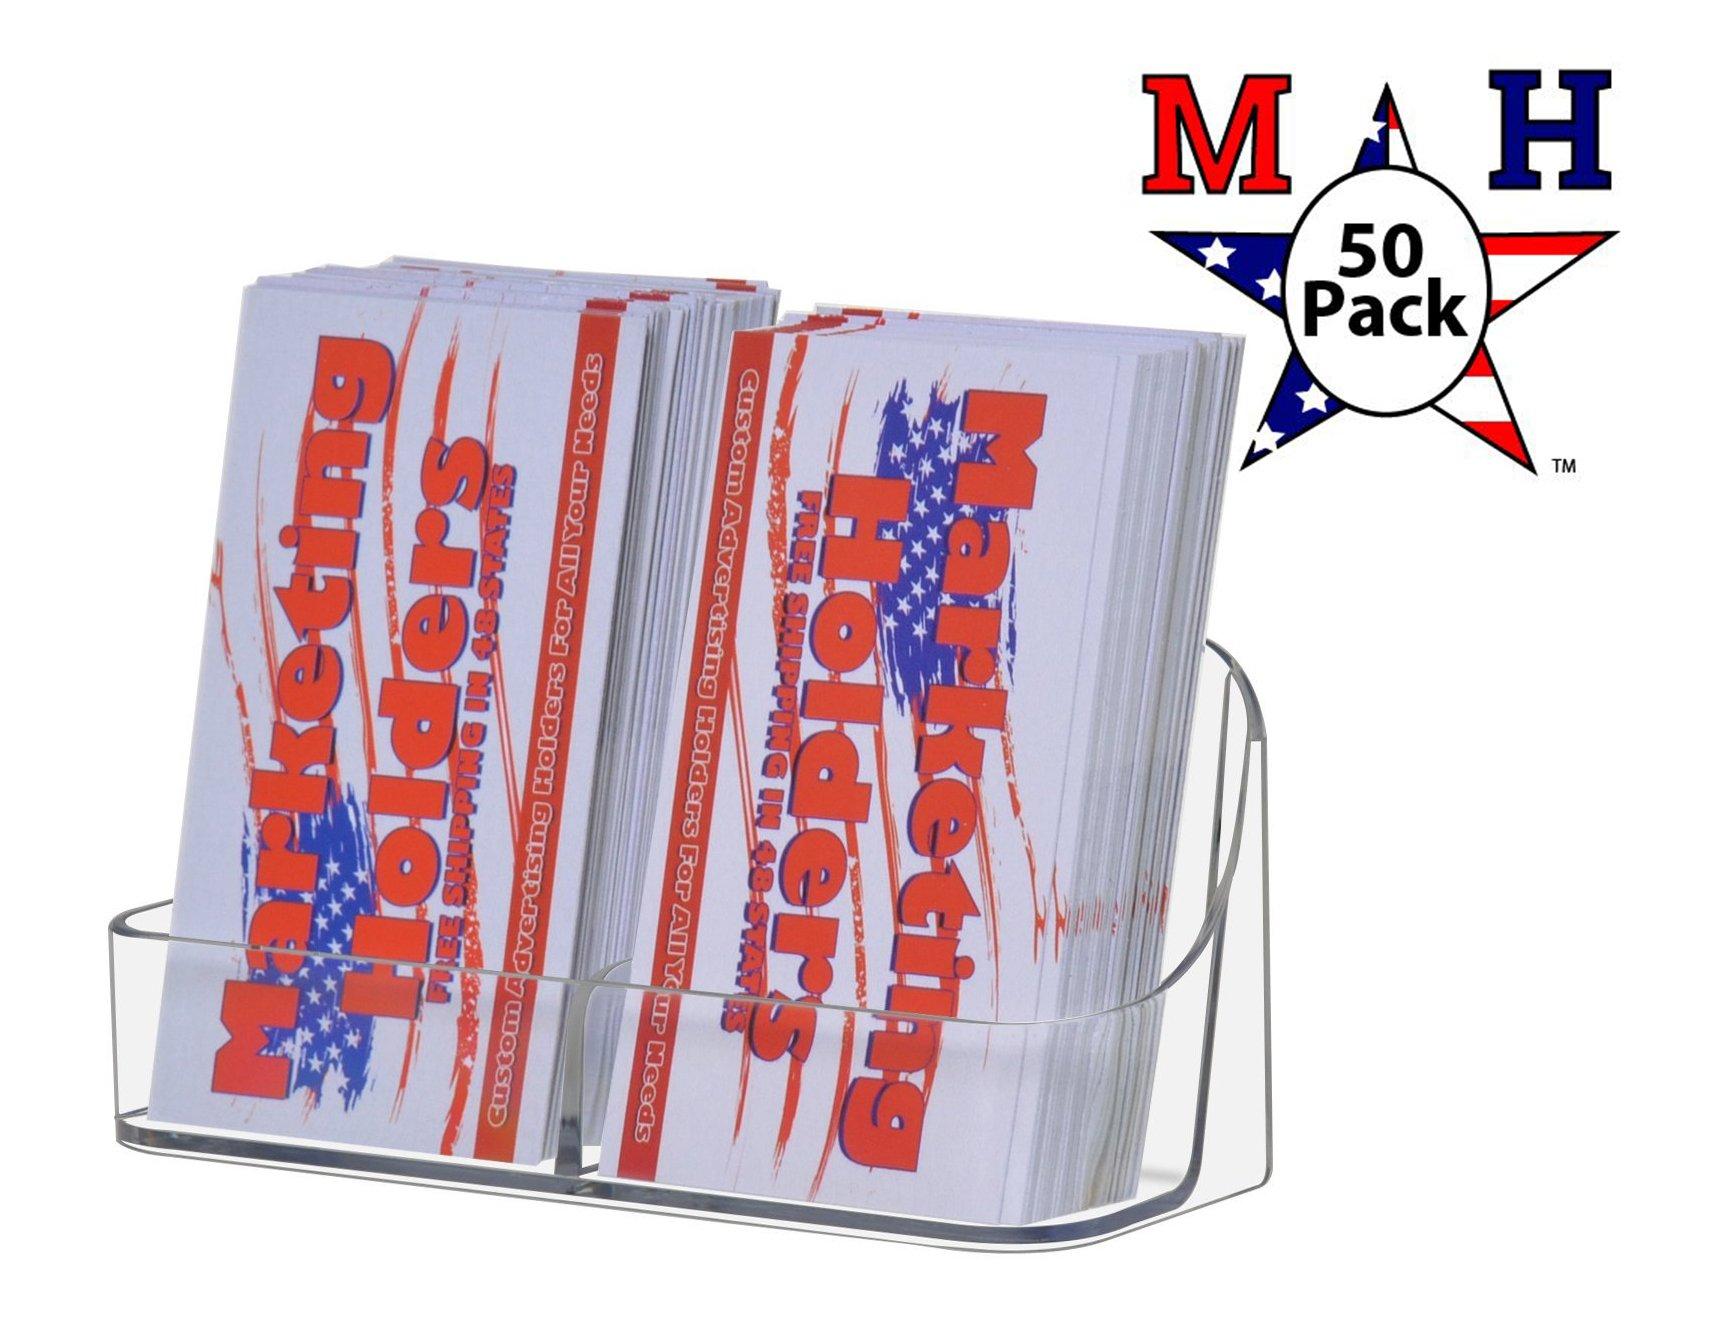 Deflect-o Single Tier 2 Pocket Portrait Business Card Holder - Transparent Clear Pack of 50